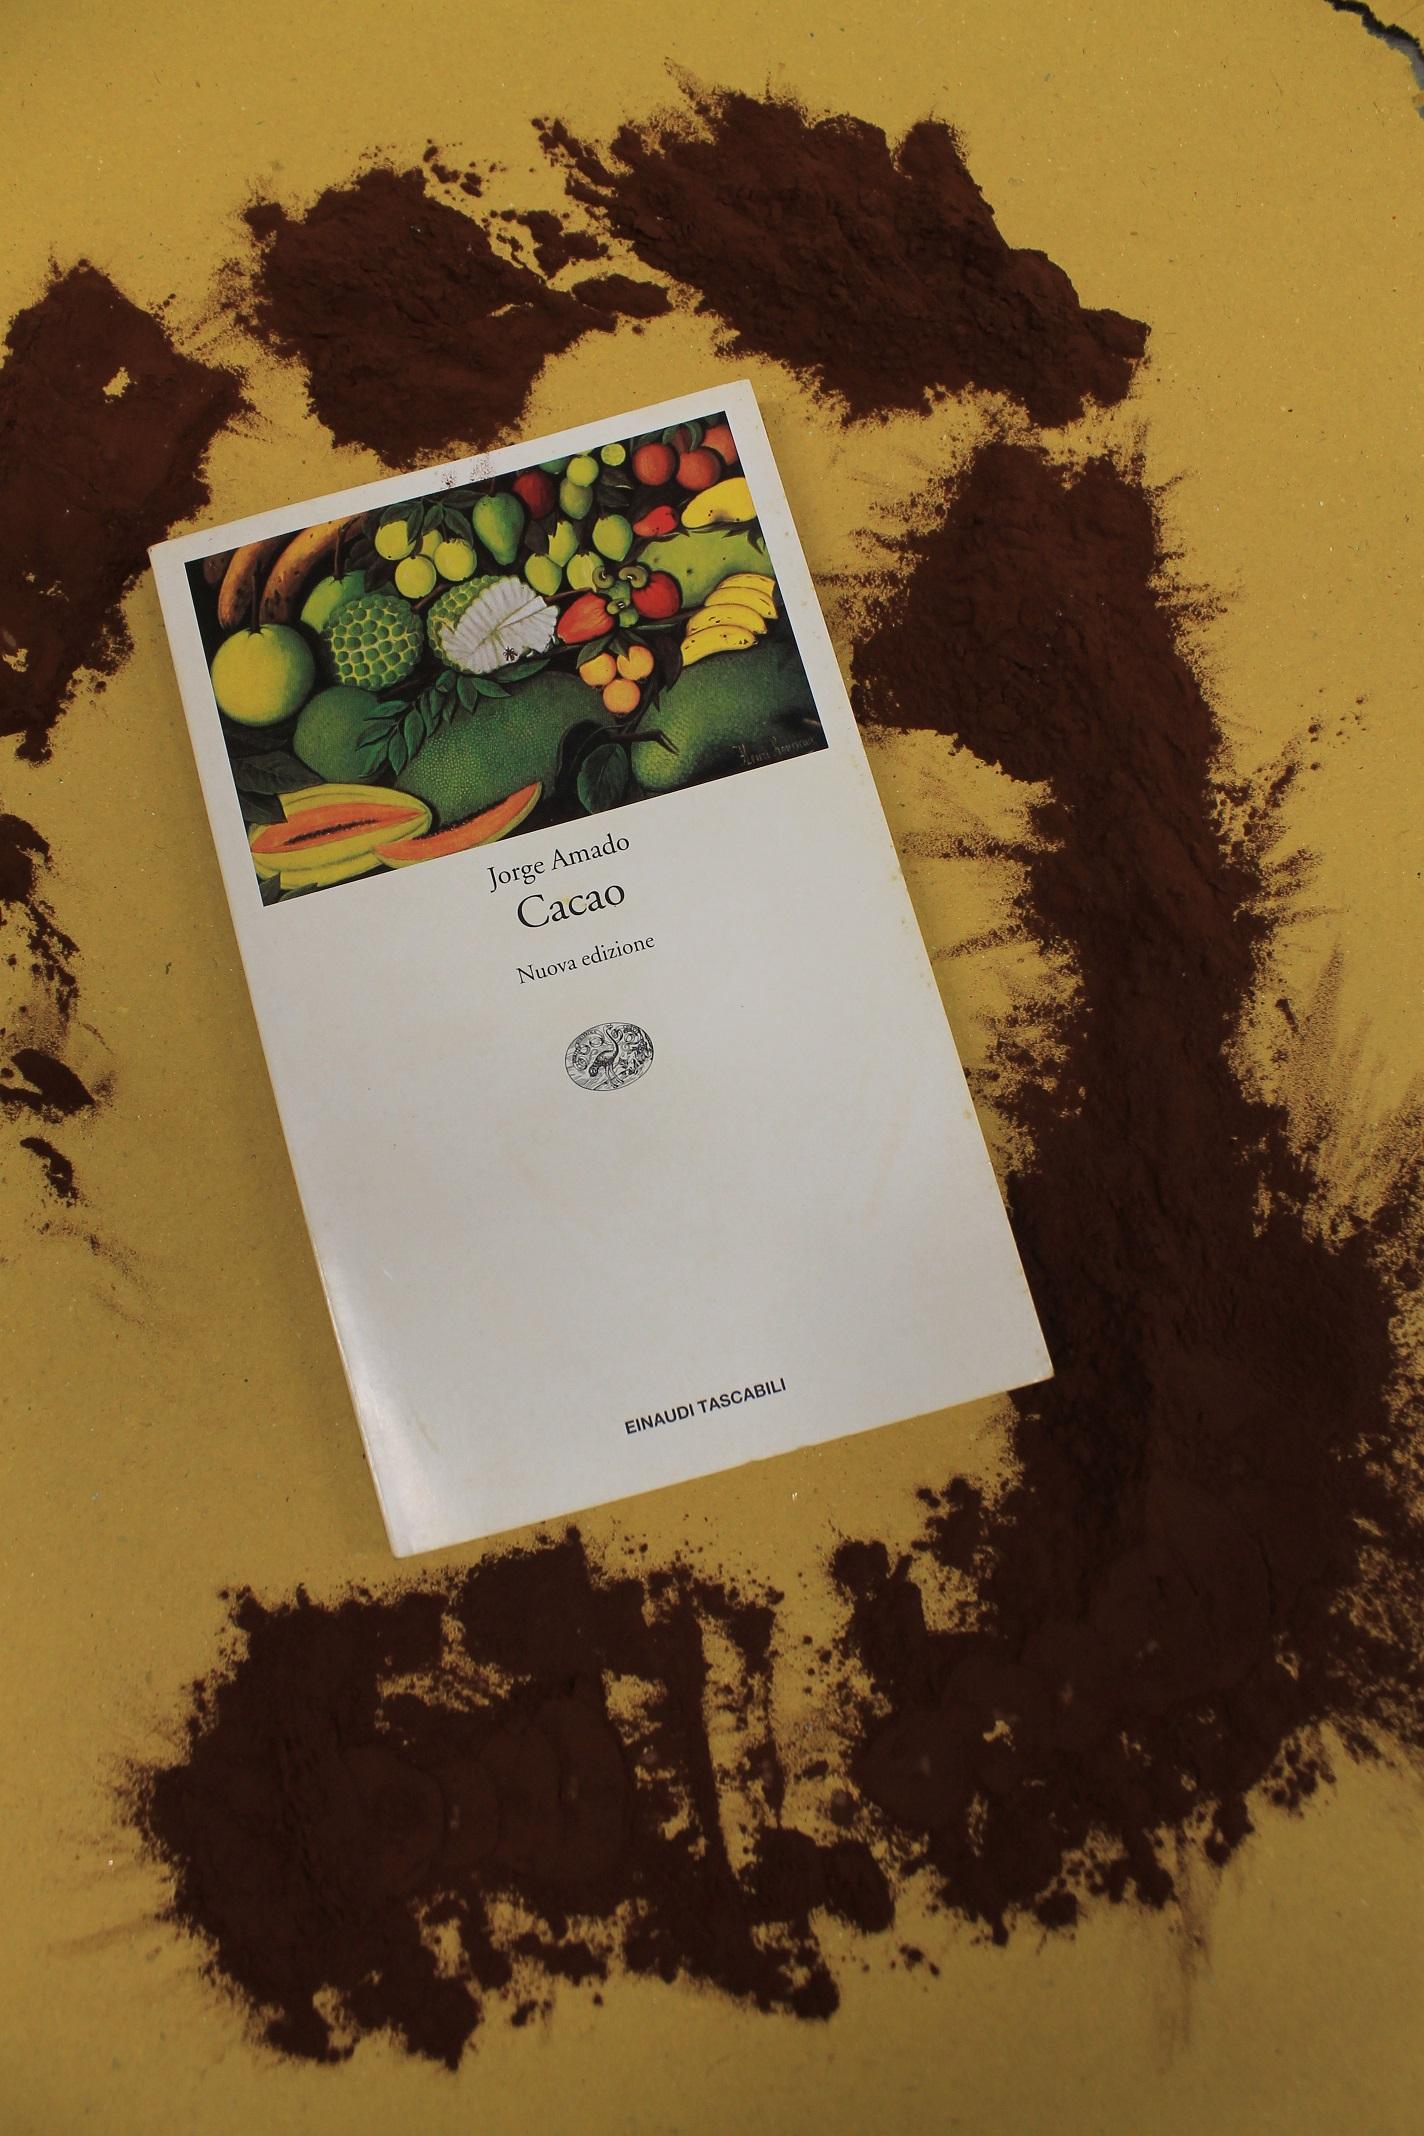 Jorge Amado, Cacao, Torronificio M. Geraci, Caltanissetta, Marcella Geraci 3